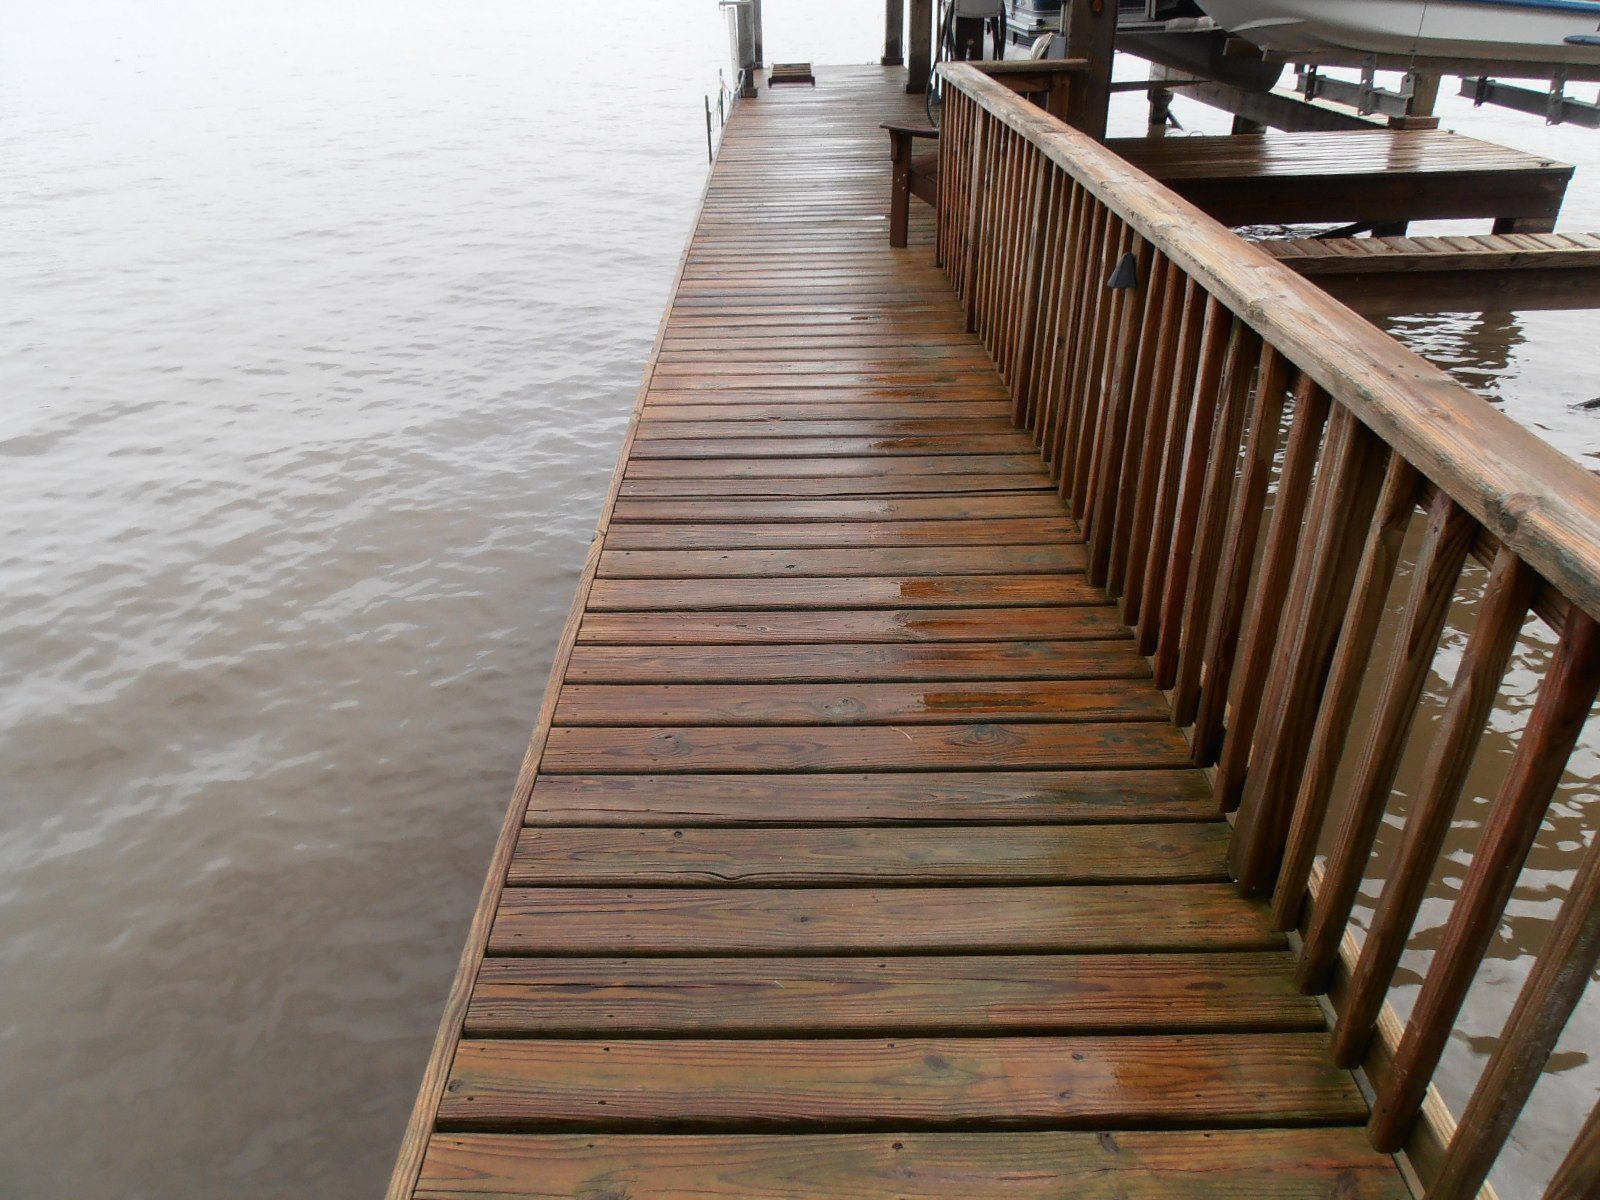 Soft Wash wood docks